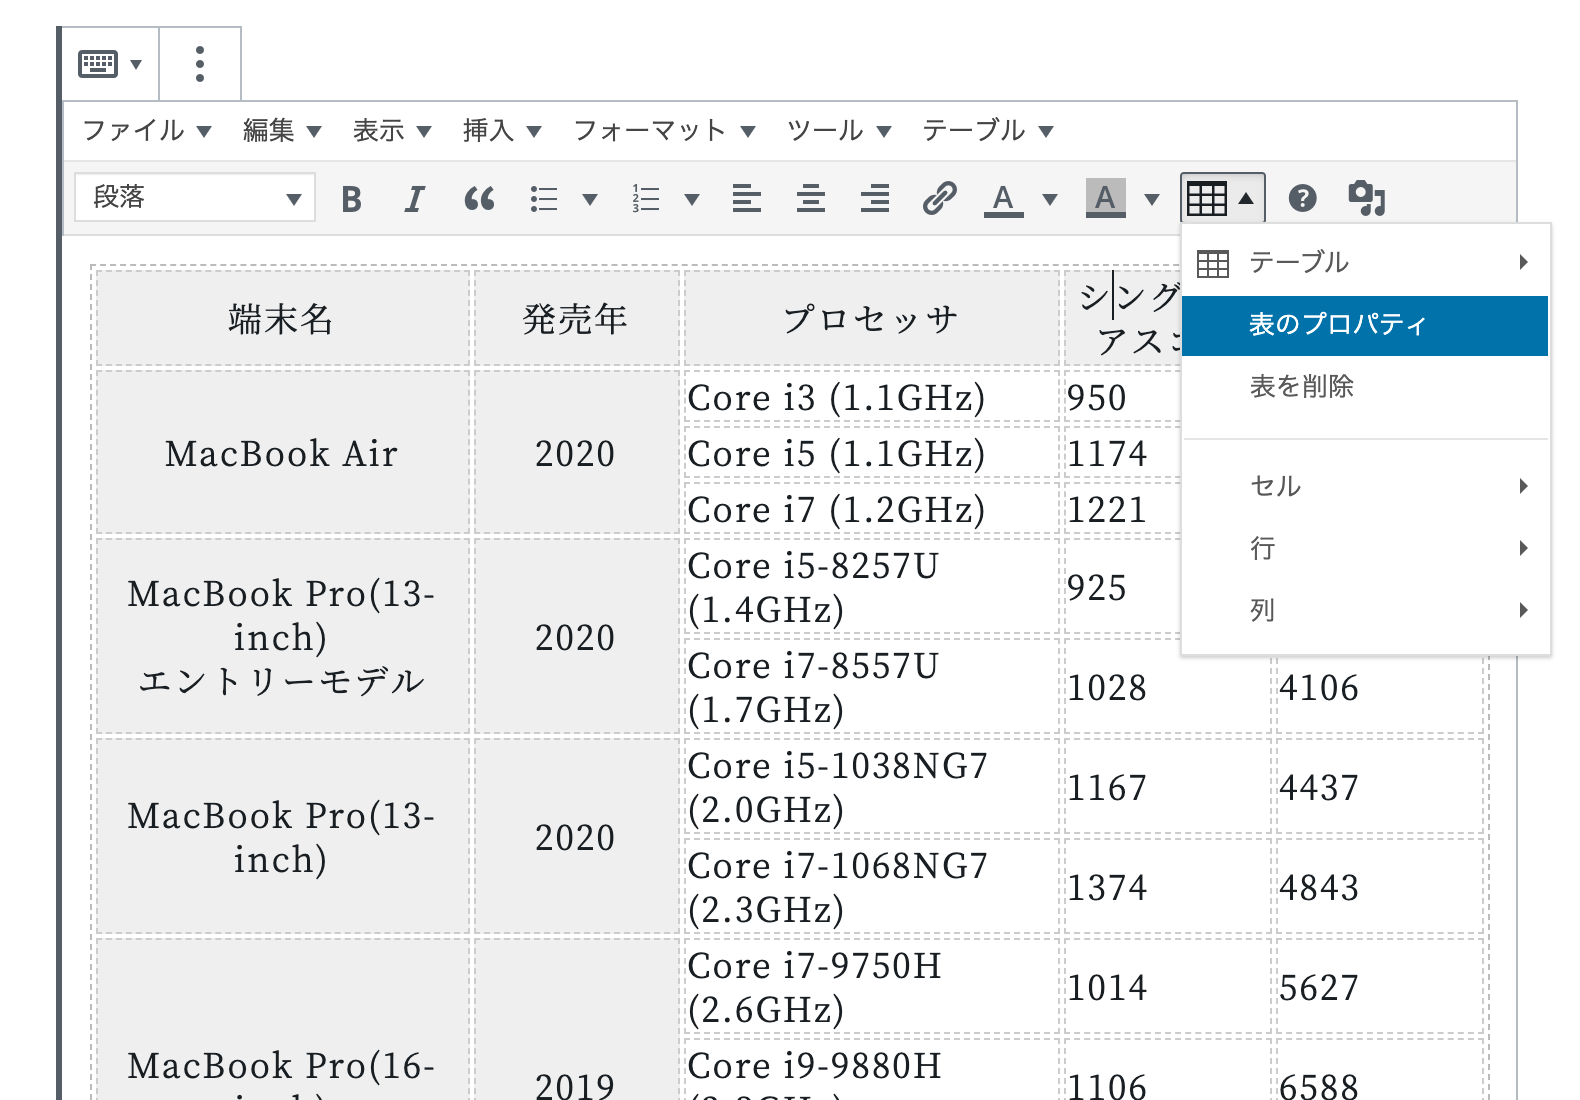 WordPressのブロックエディタで複雑な表を作る方法